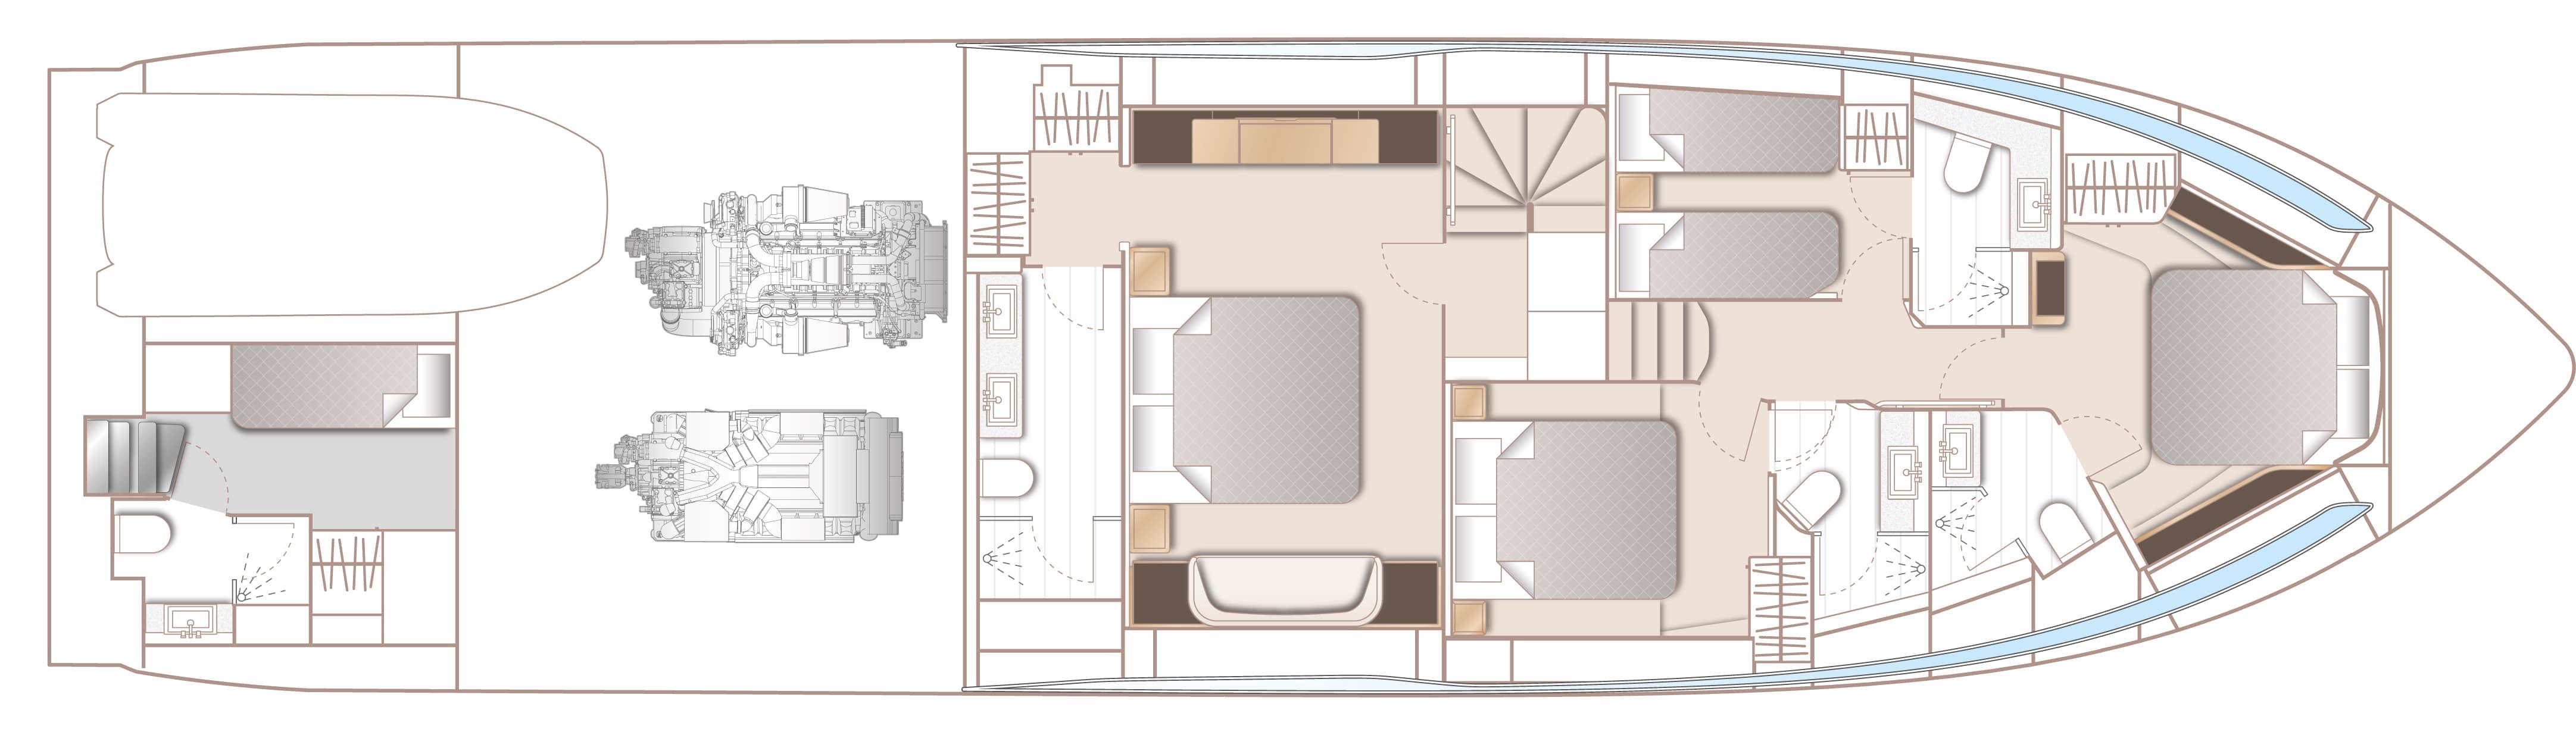 v78 layout lower deck